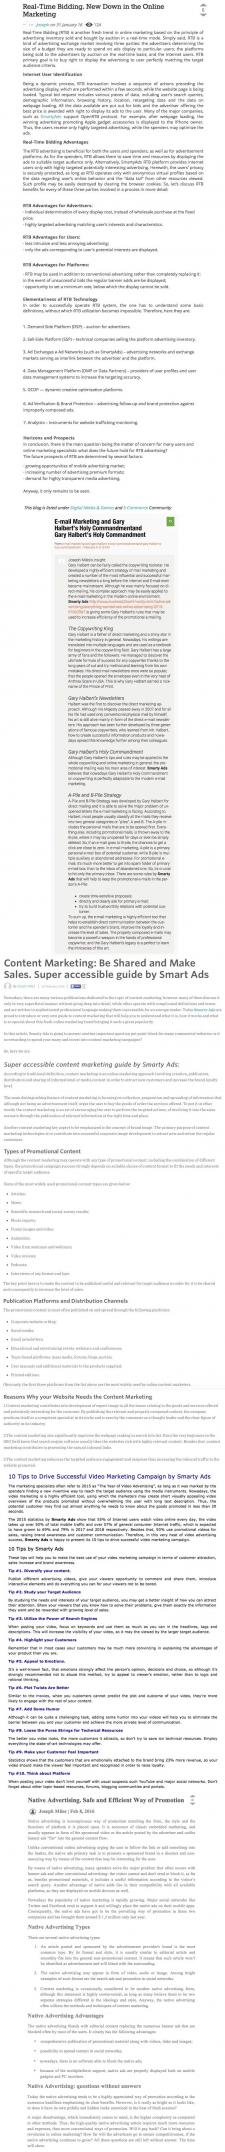 EN | МАРКЕТИНГ, Статьи на тему интернет-маркетинга